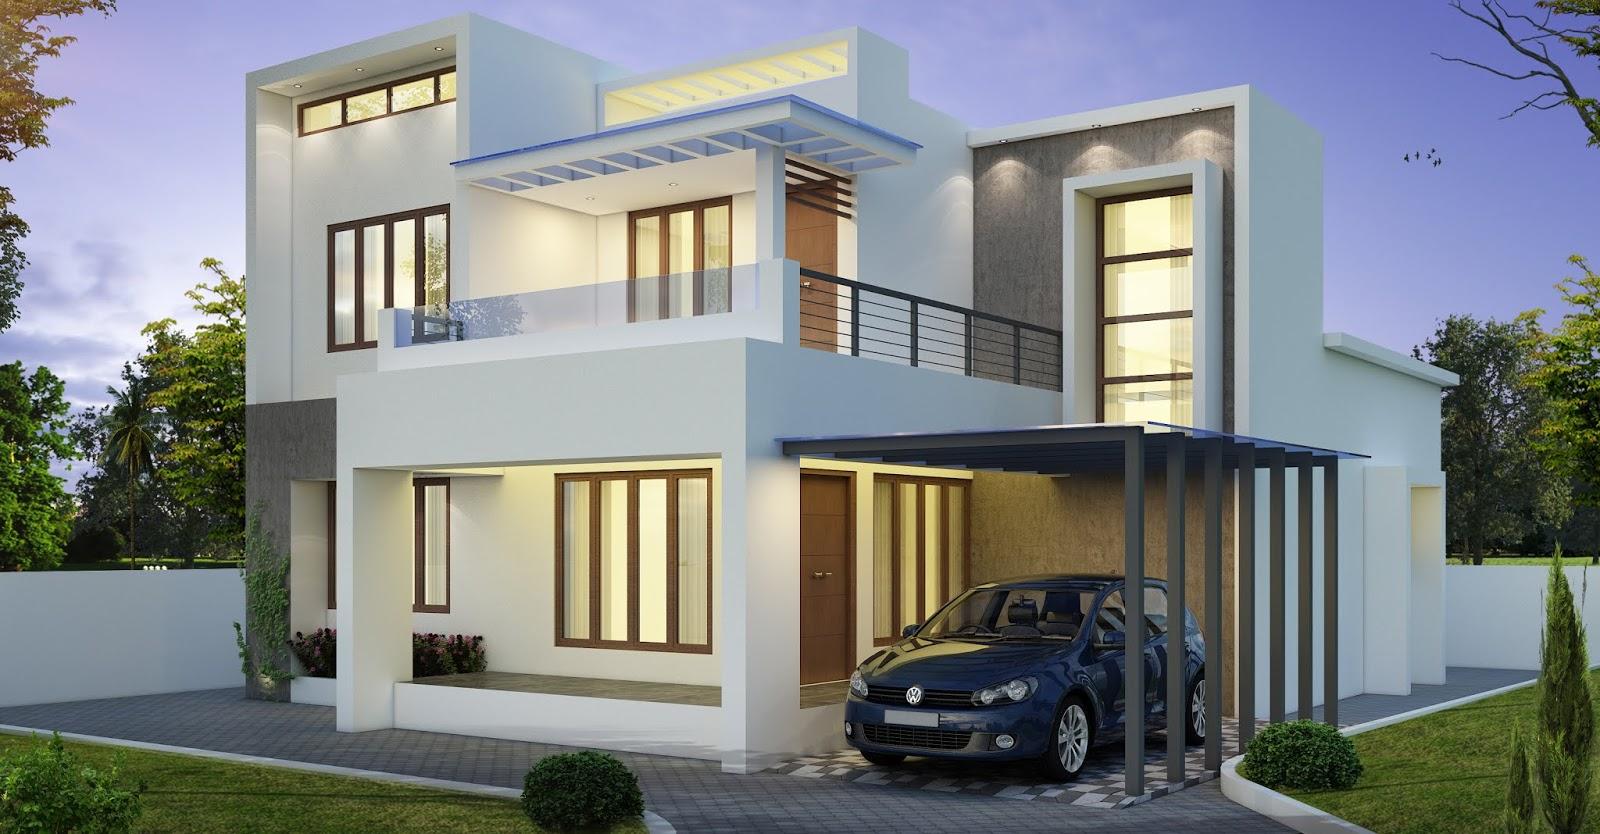 Simple contemporary design 3 Bedroom Kerala home design staircase